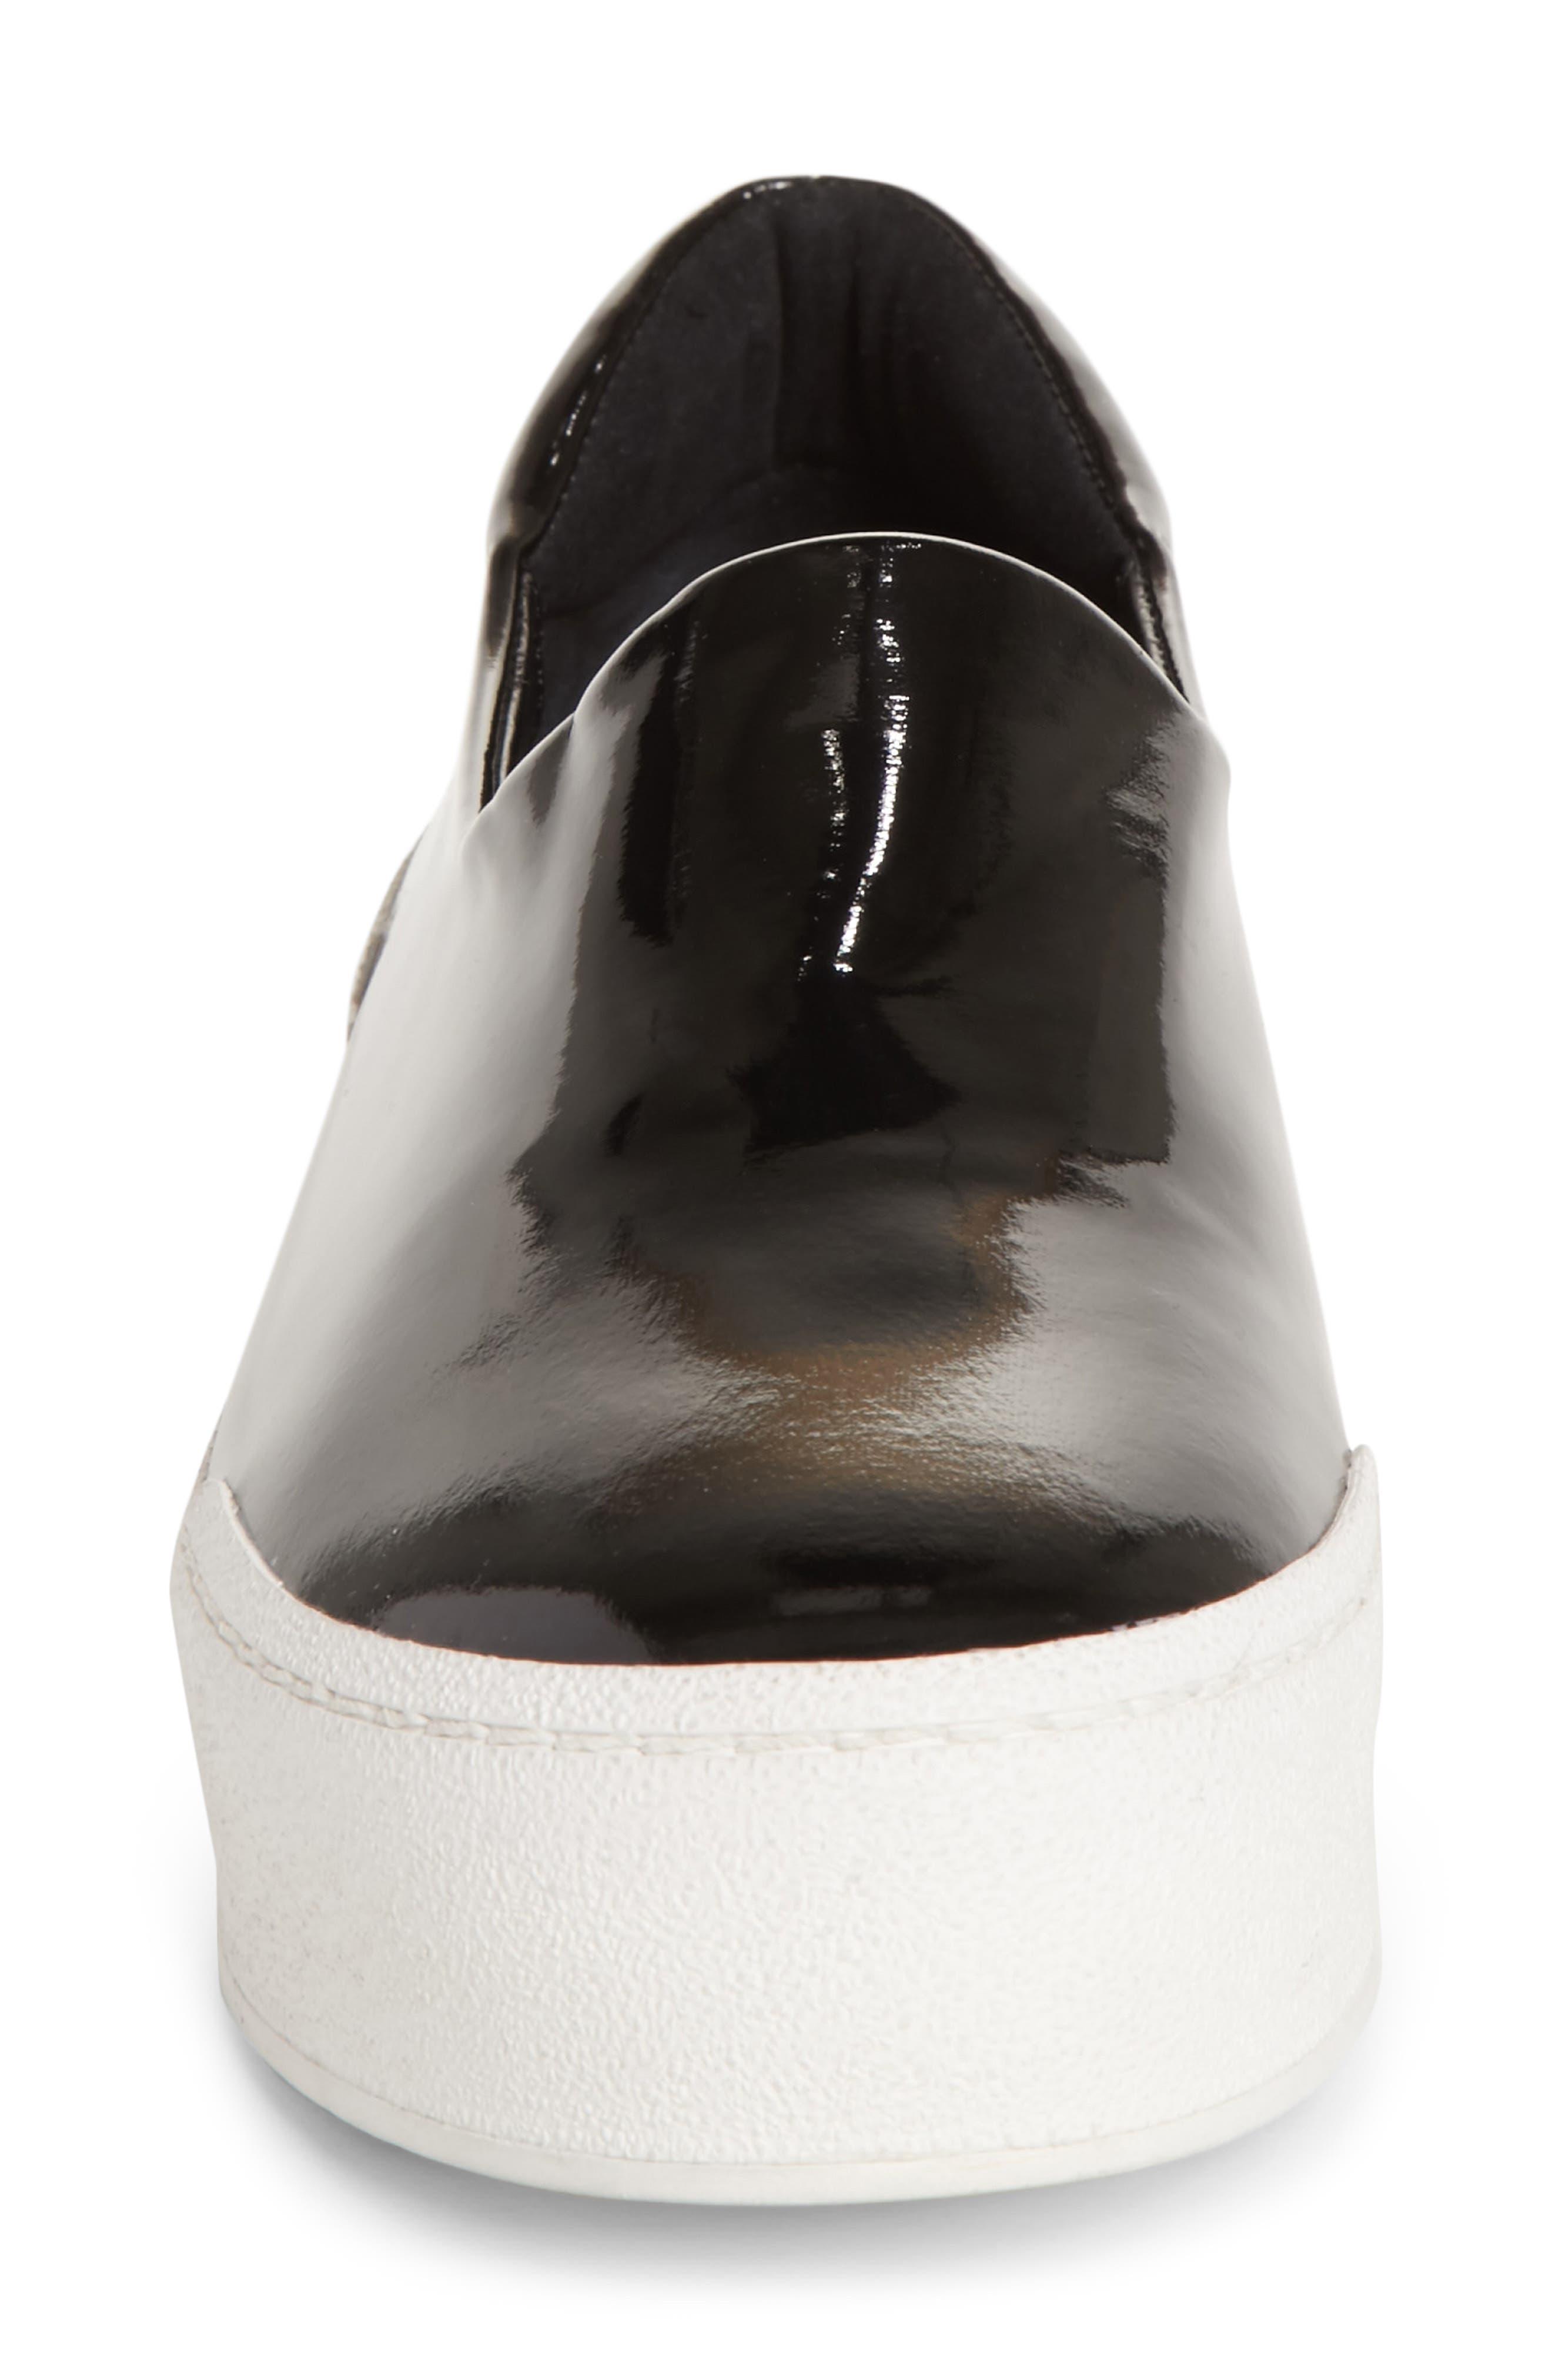 Didi Slip-On Sneaker,                             Alternate thumbnail 4, color,                             001